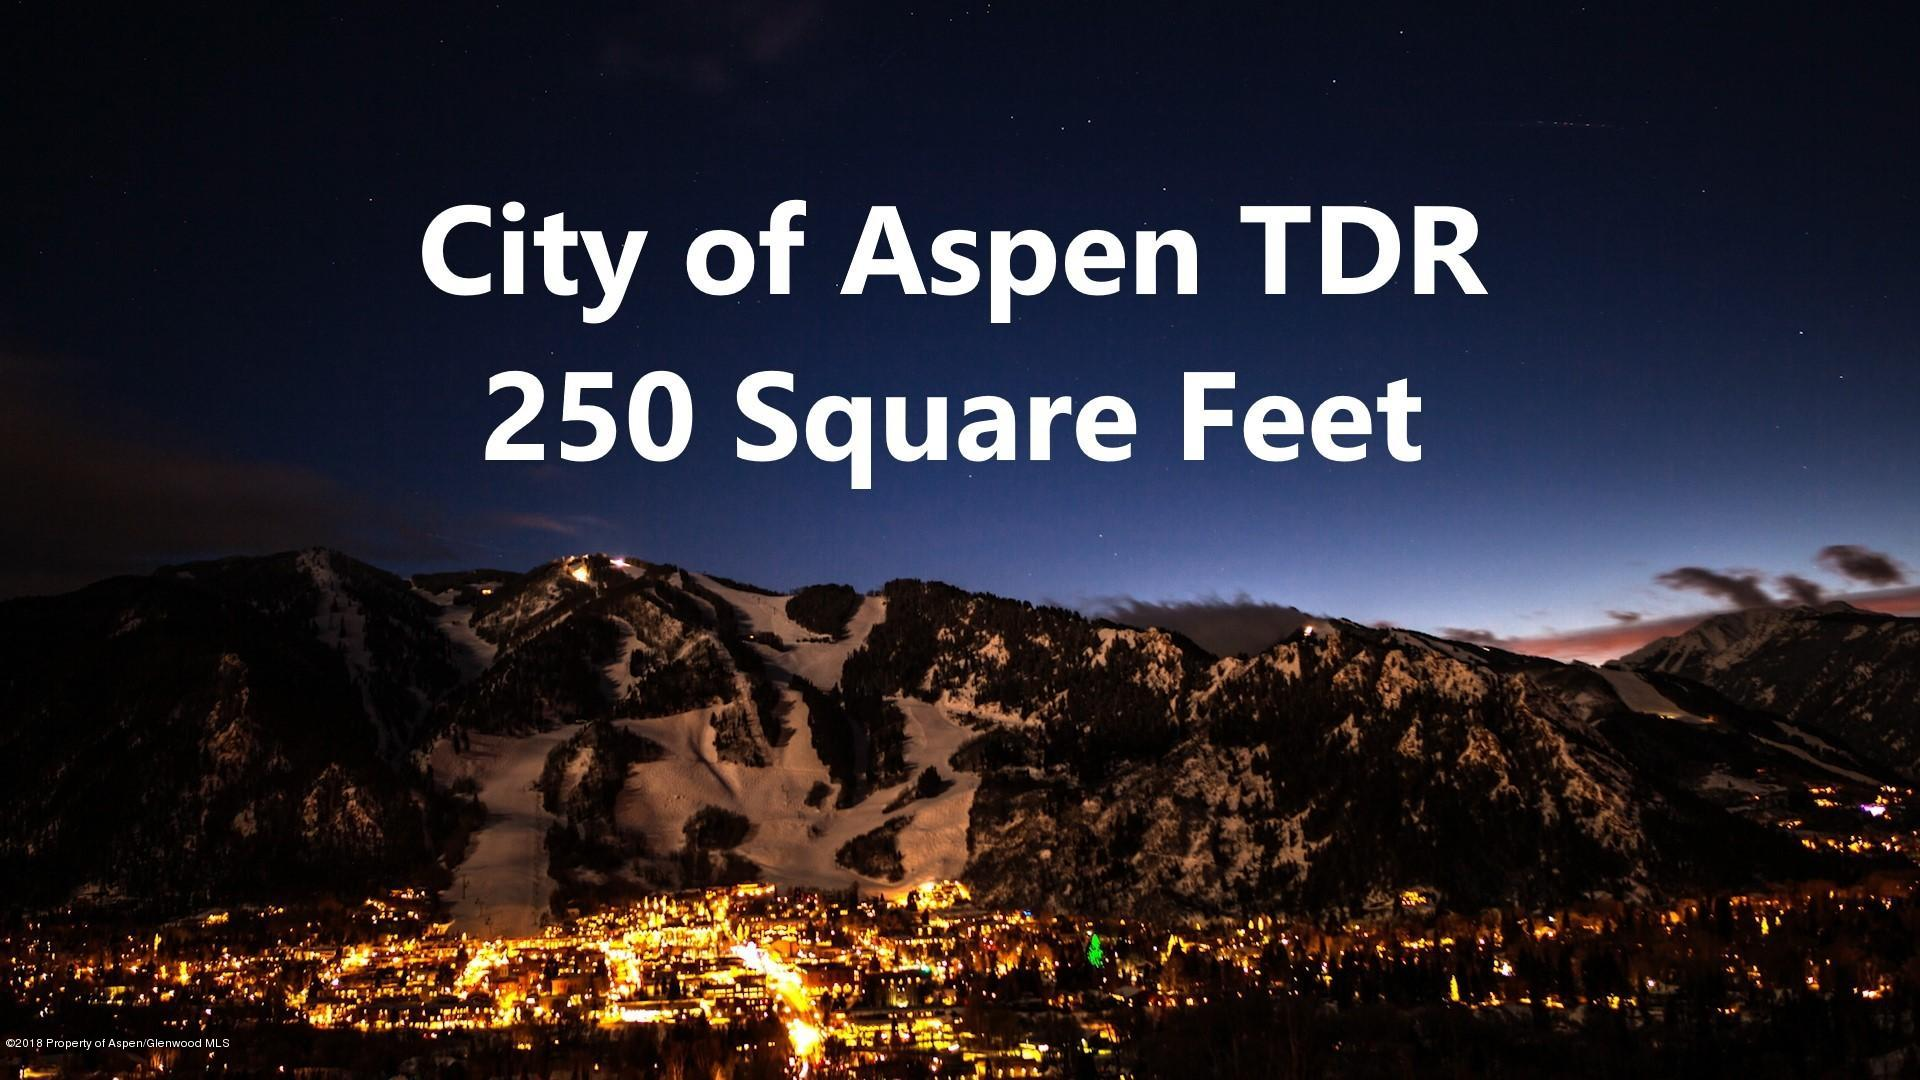 TDR City City of Aspen - Central Core, Colorado